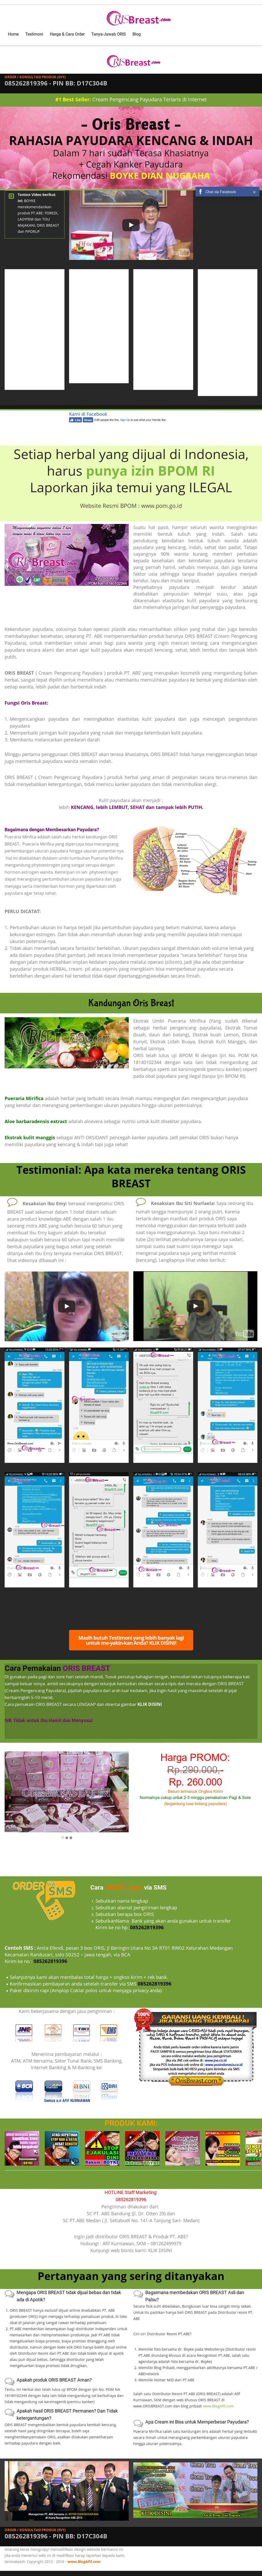 Oris Breast Cream Competitors Revenue And Employees Owler Company Pengencang Payudara Ampamp Cegah Kanker Profile